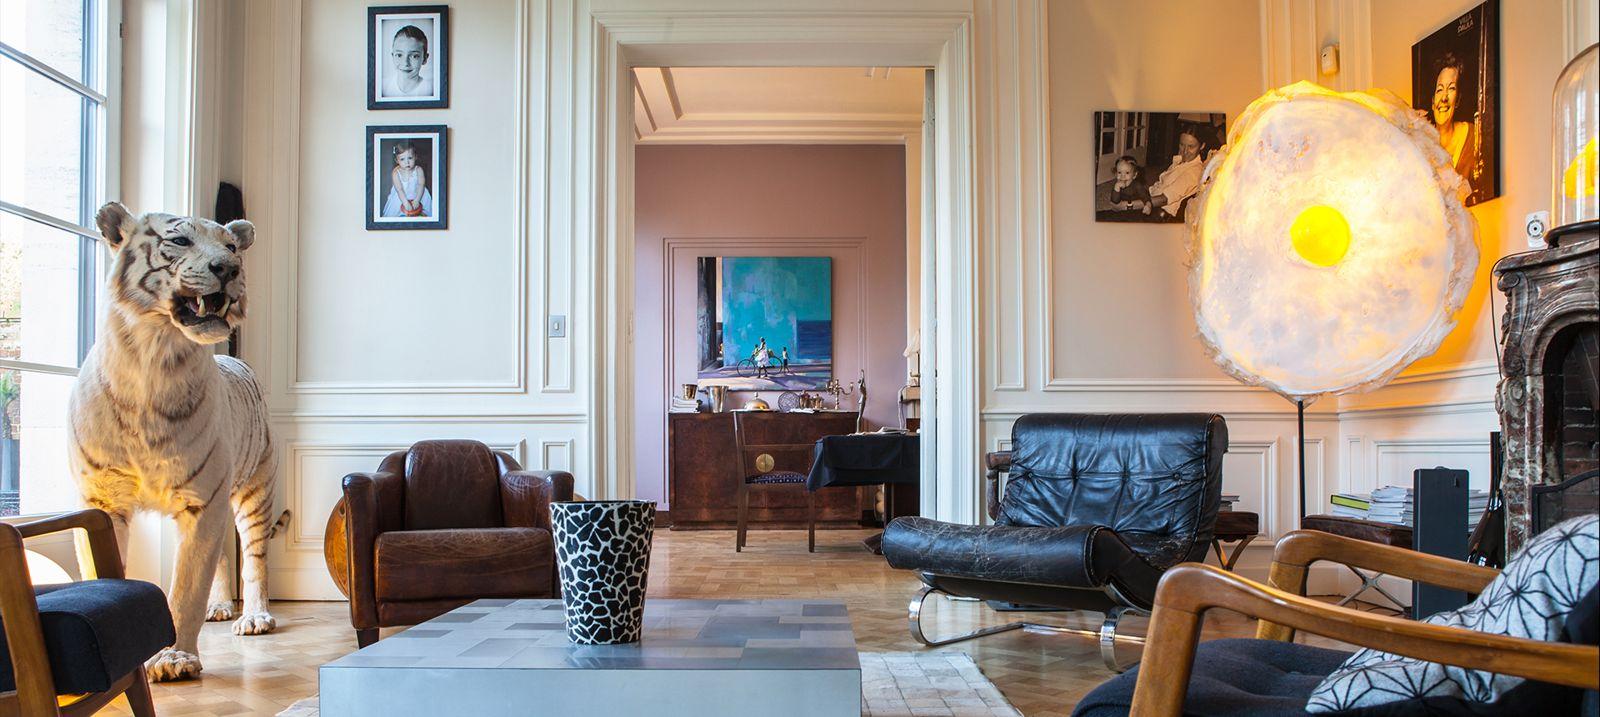 Chambres Dhtes Lille Roubaix Tourcoing Villa Paula